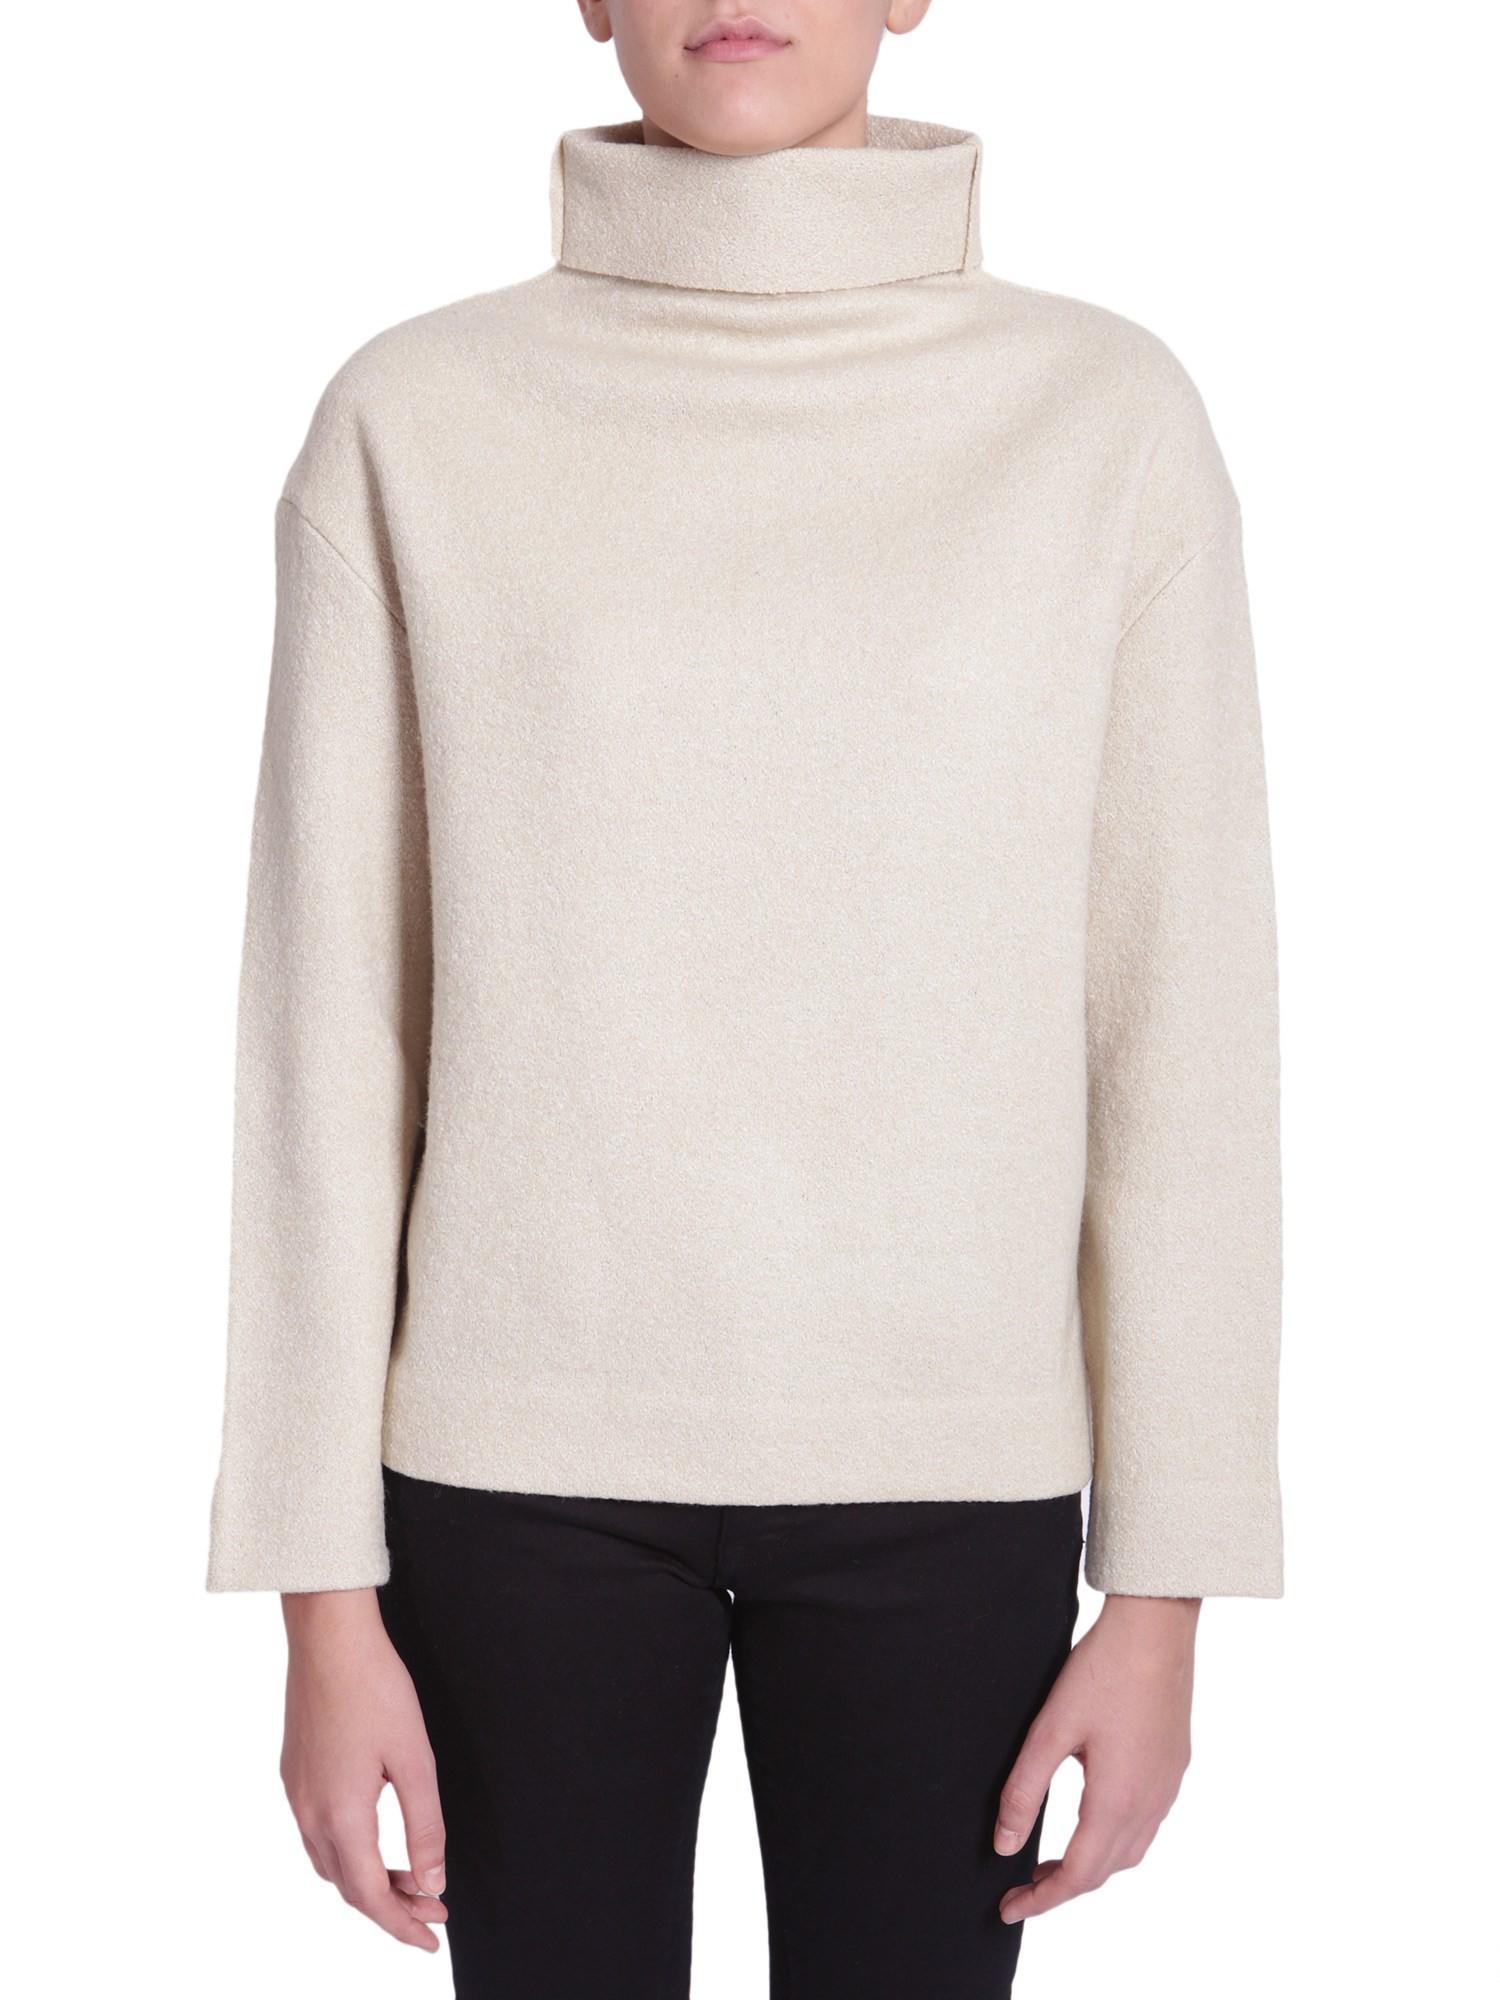 toile isabel marant turtle neck sweater in beige lyst. Black Bedroom Furniture Sets. Home Design Ideas